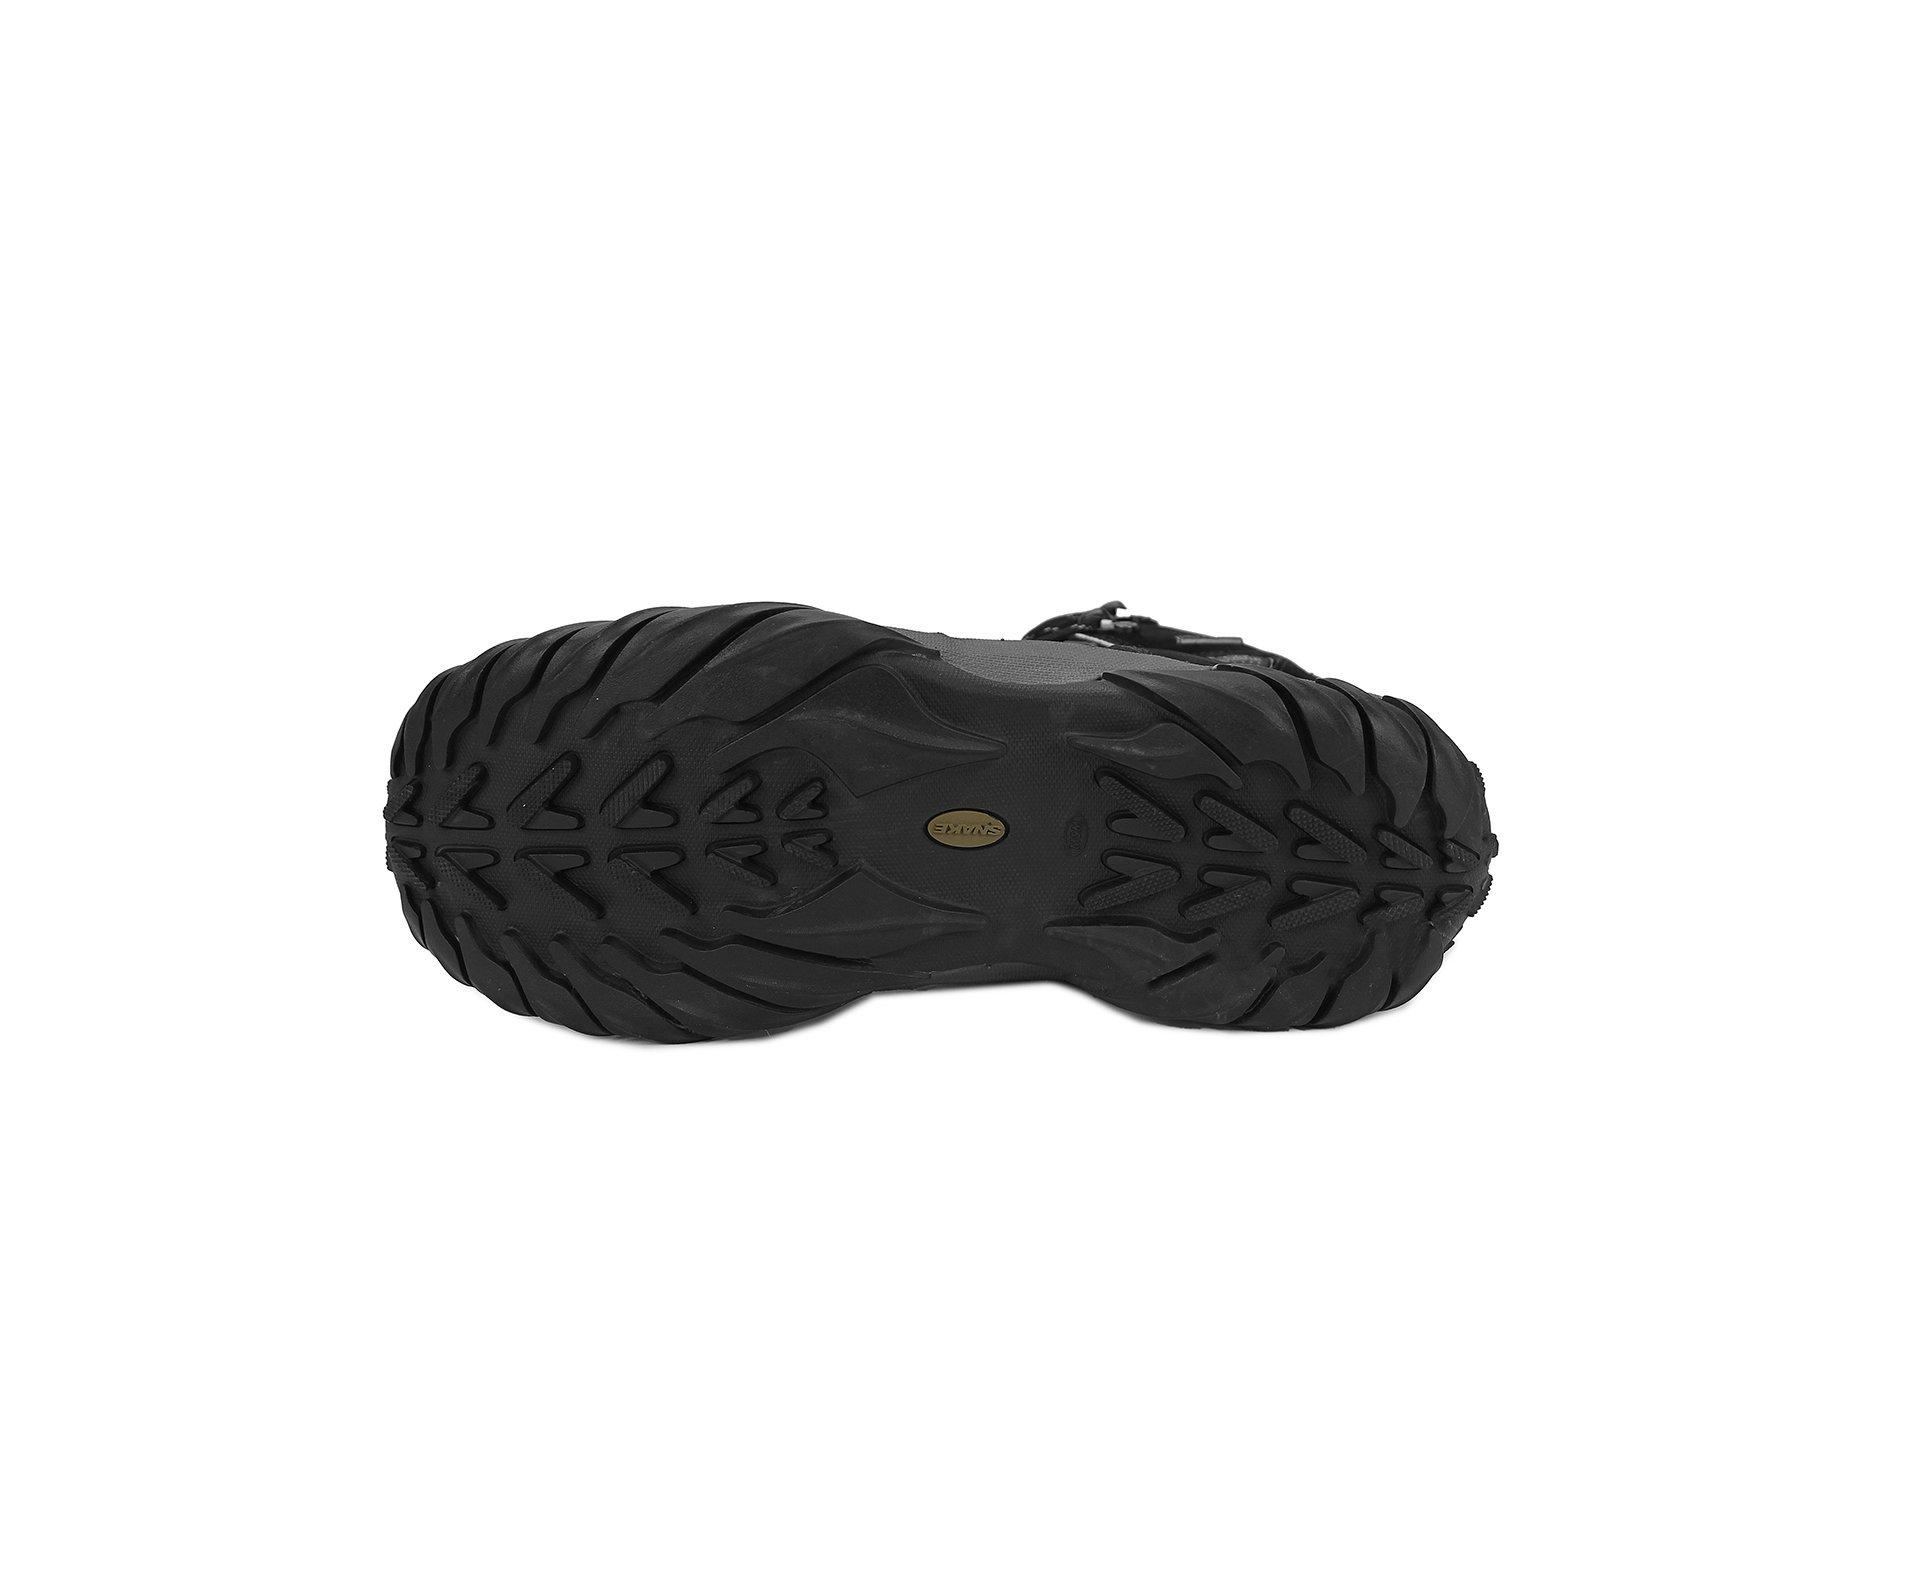 Bota Snake Andina X-treme Dry Pt/ve C.a 34.186 - 44